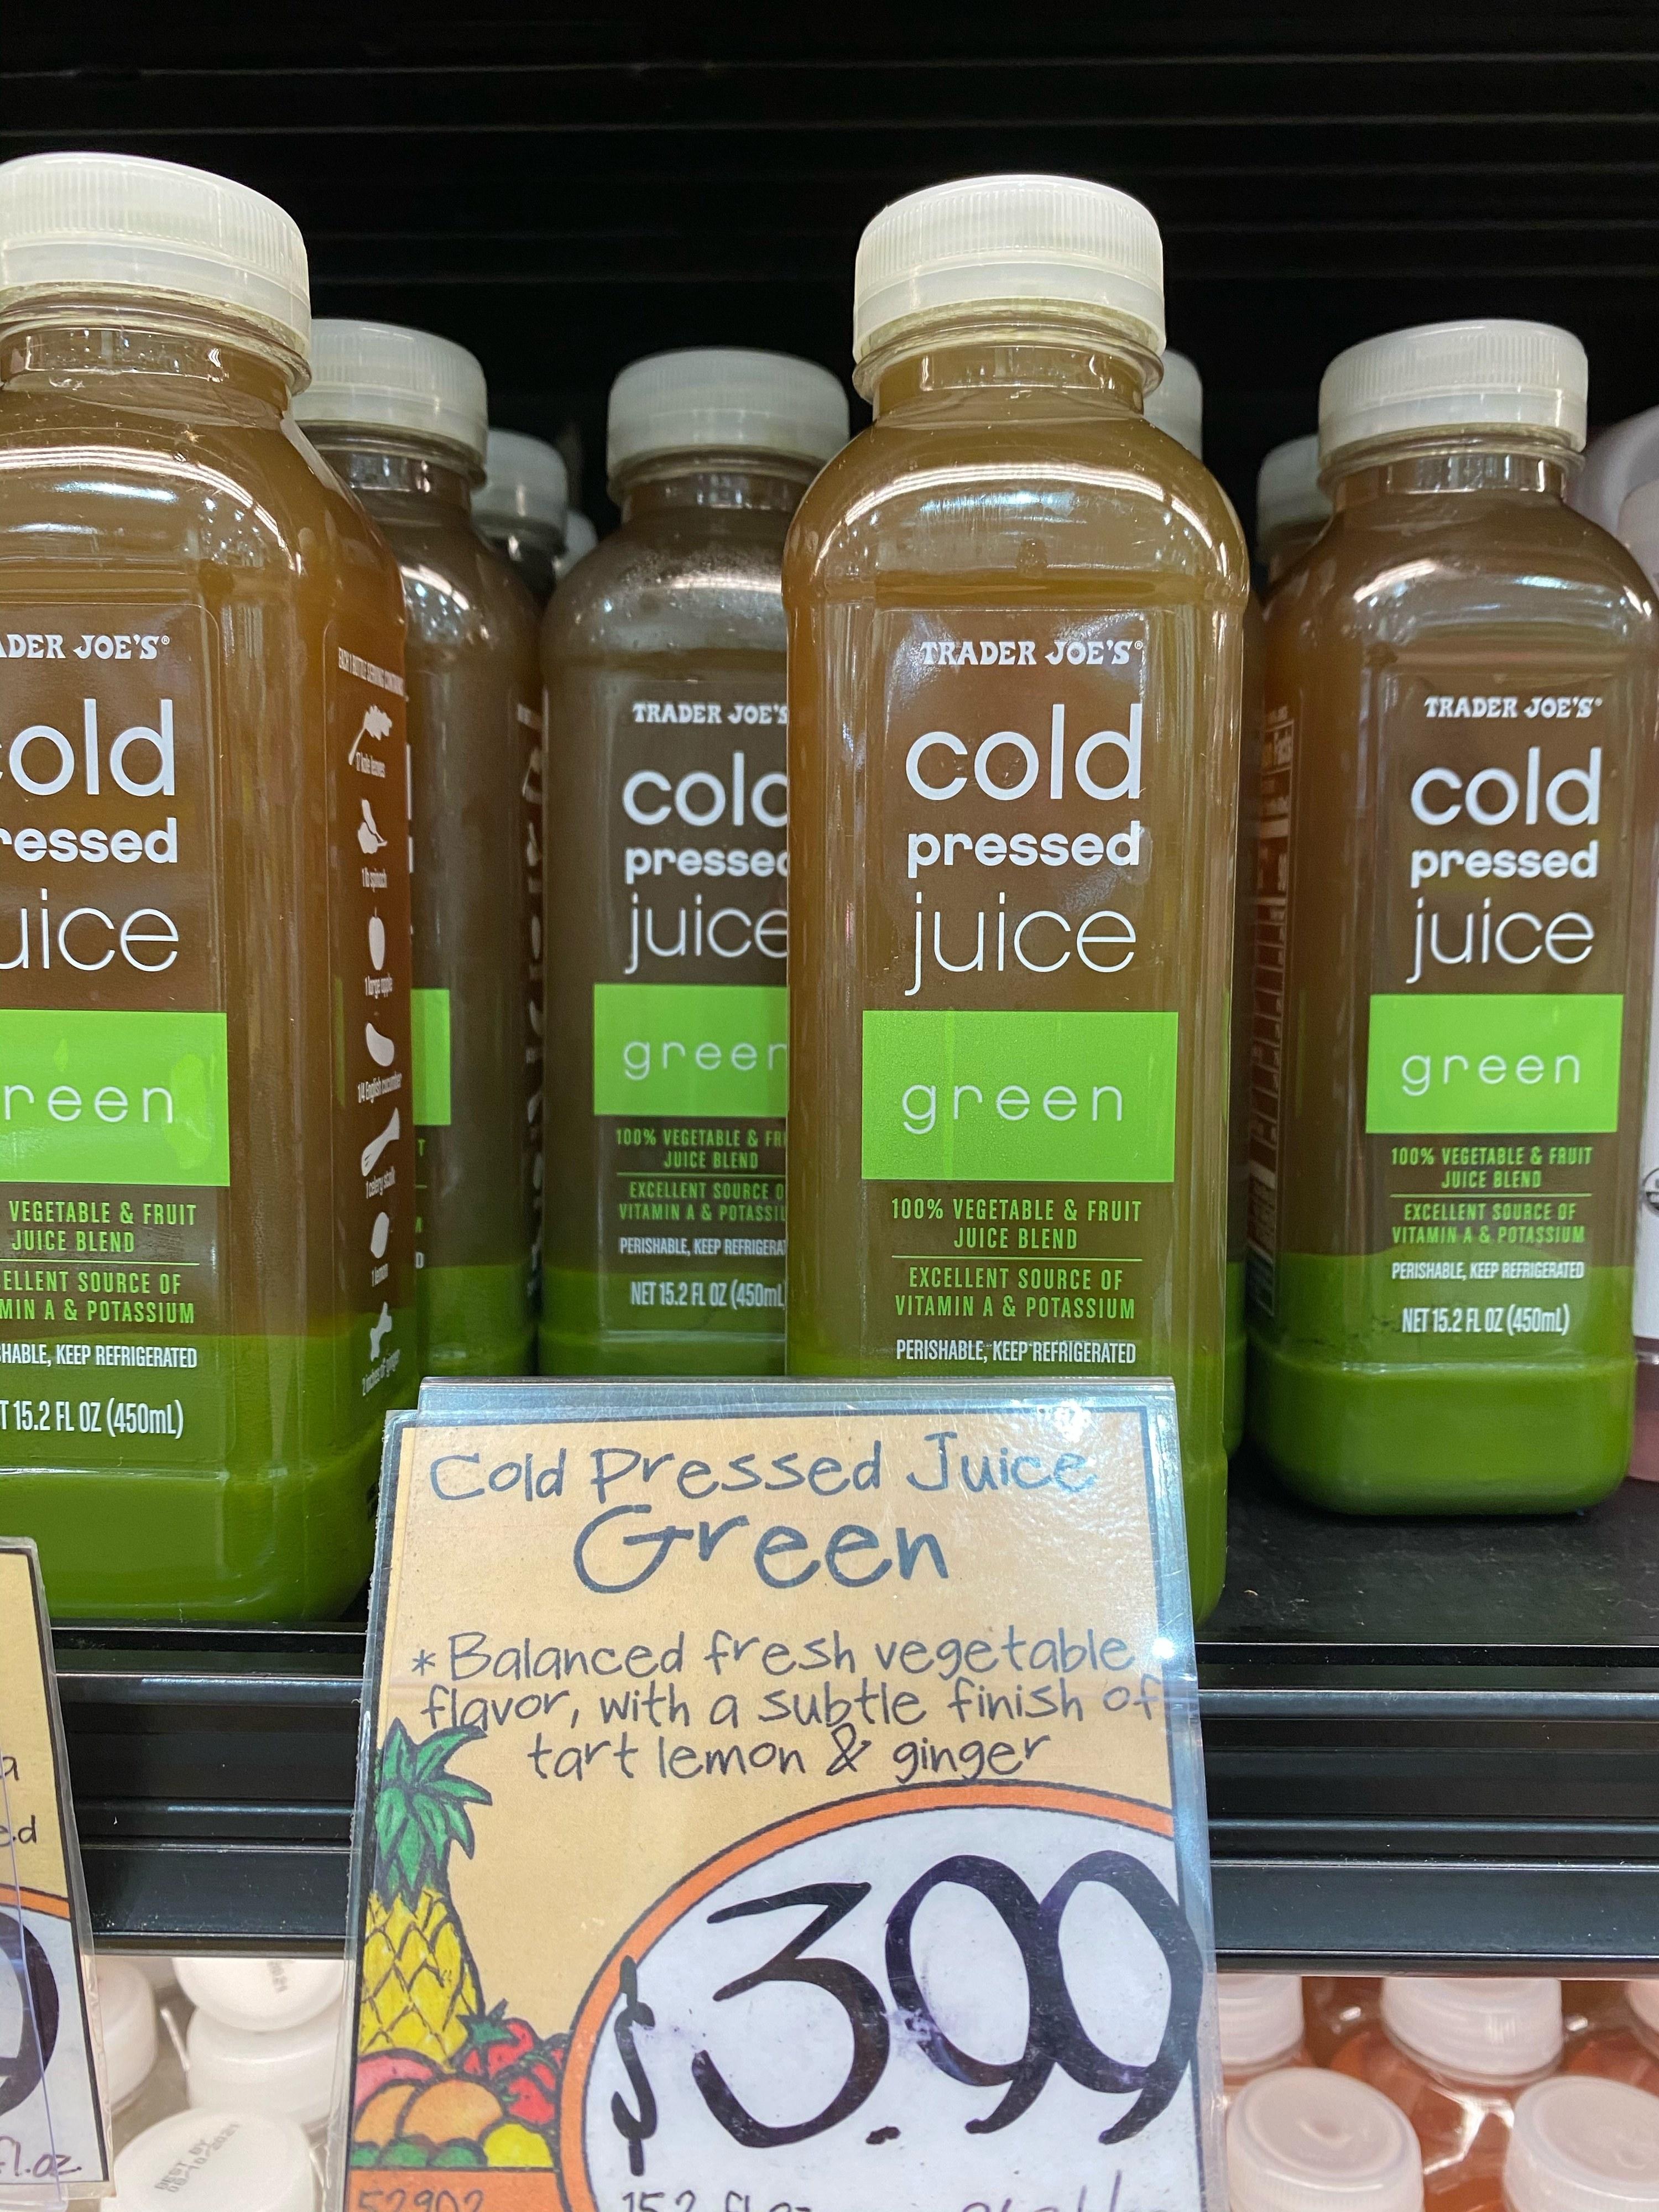 Trader Joe's cold pressed green juice.